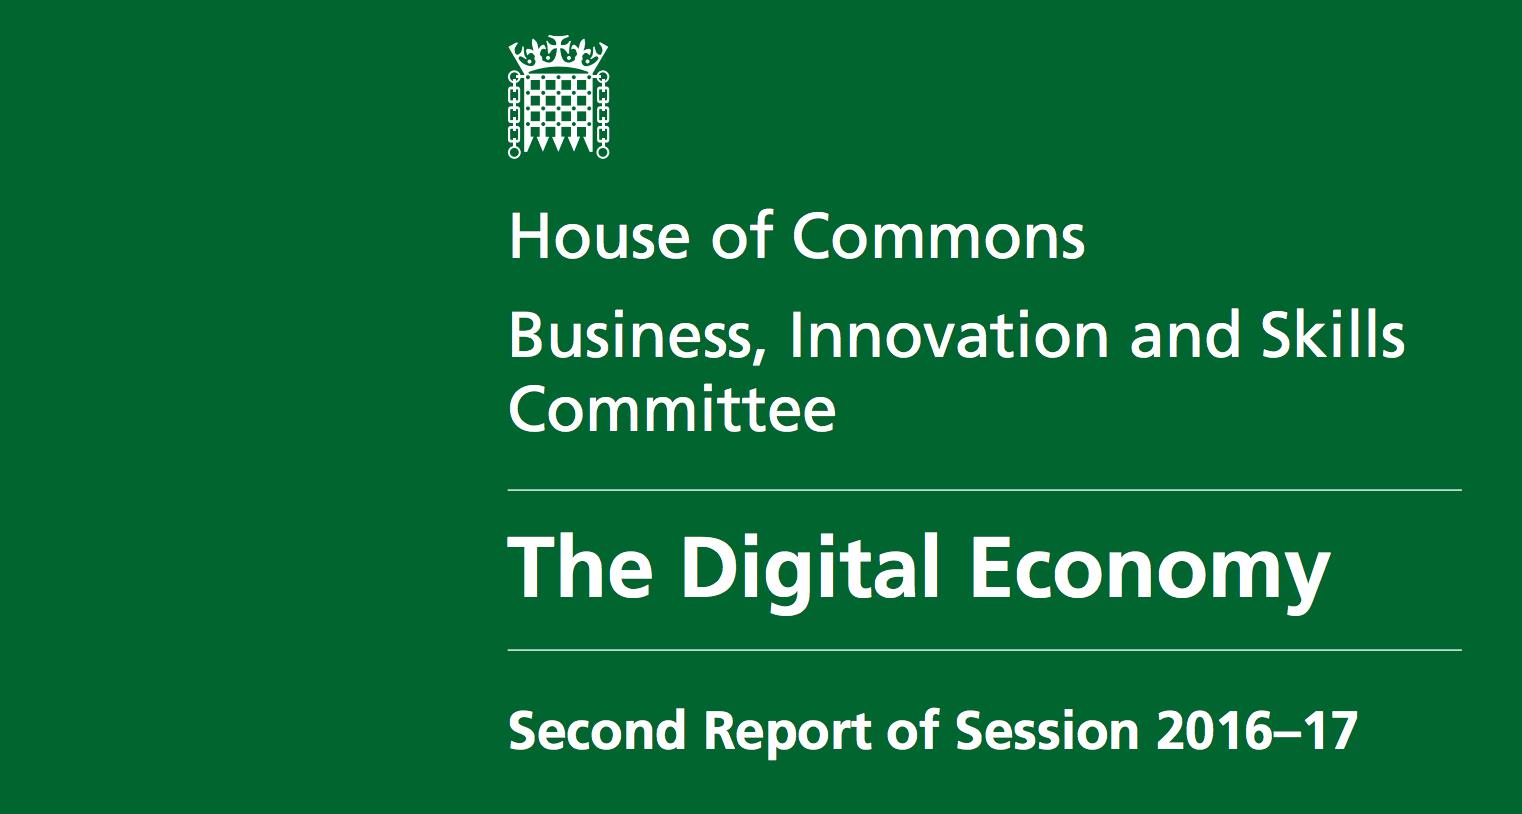 measured_brilliance-the_digital_economy_report